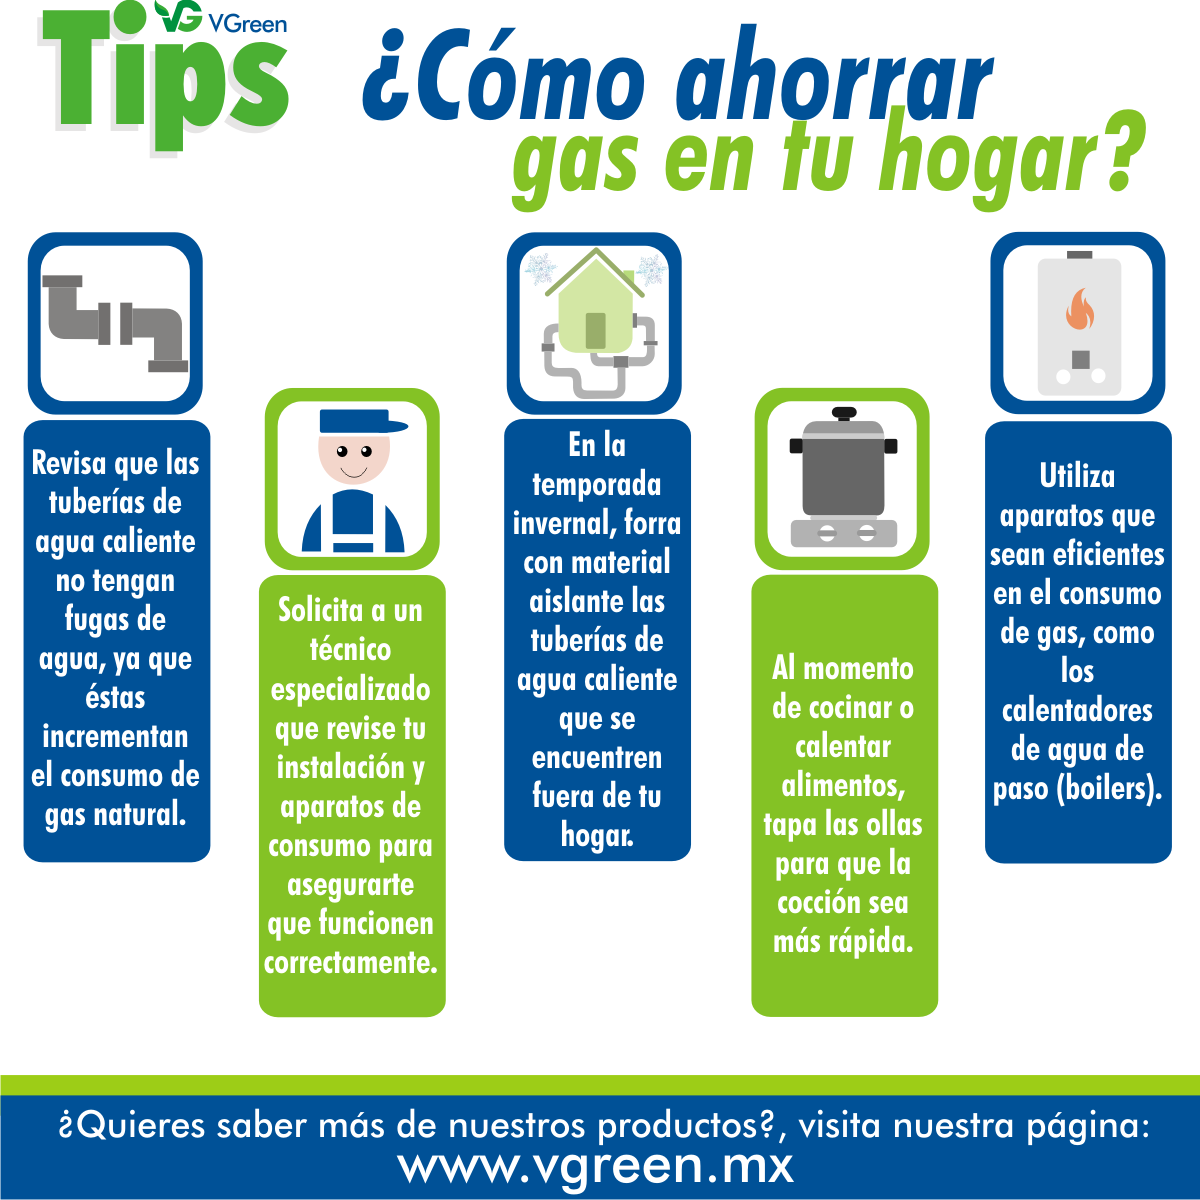 Pin de vgreen m xico en vgreen tips medio ambiente cuidado del medio ambiente y medioambiente - Consejos de reciclaje ...